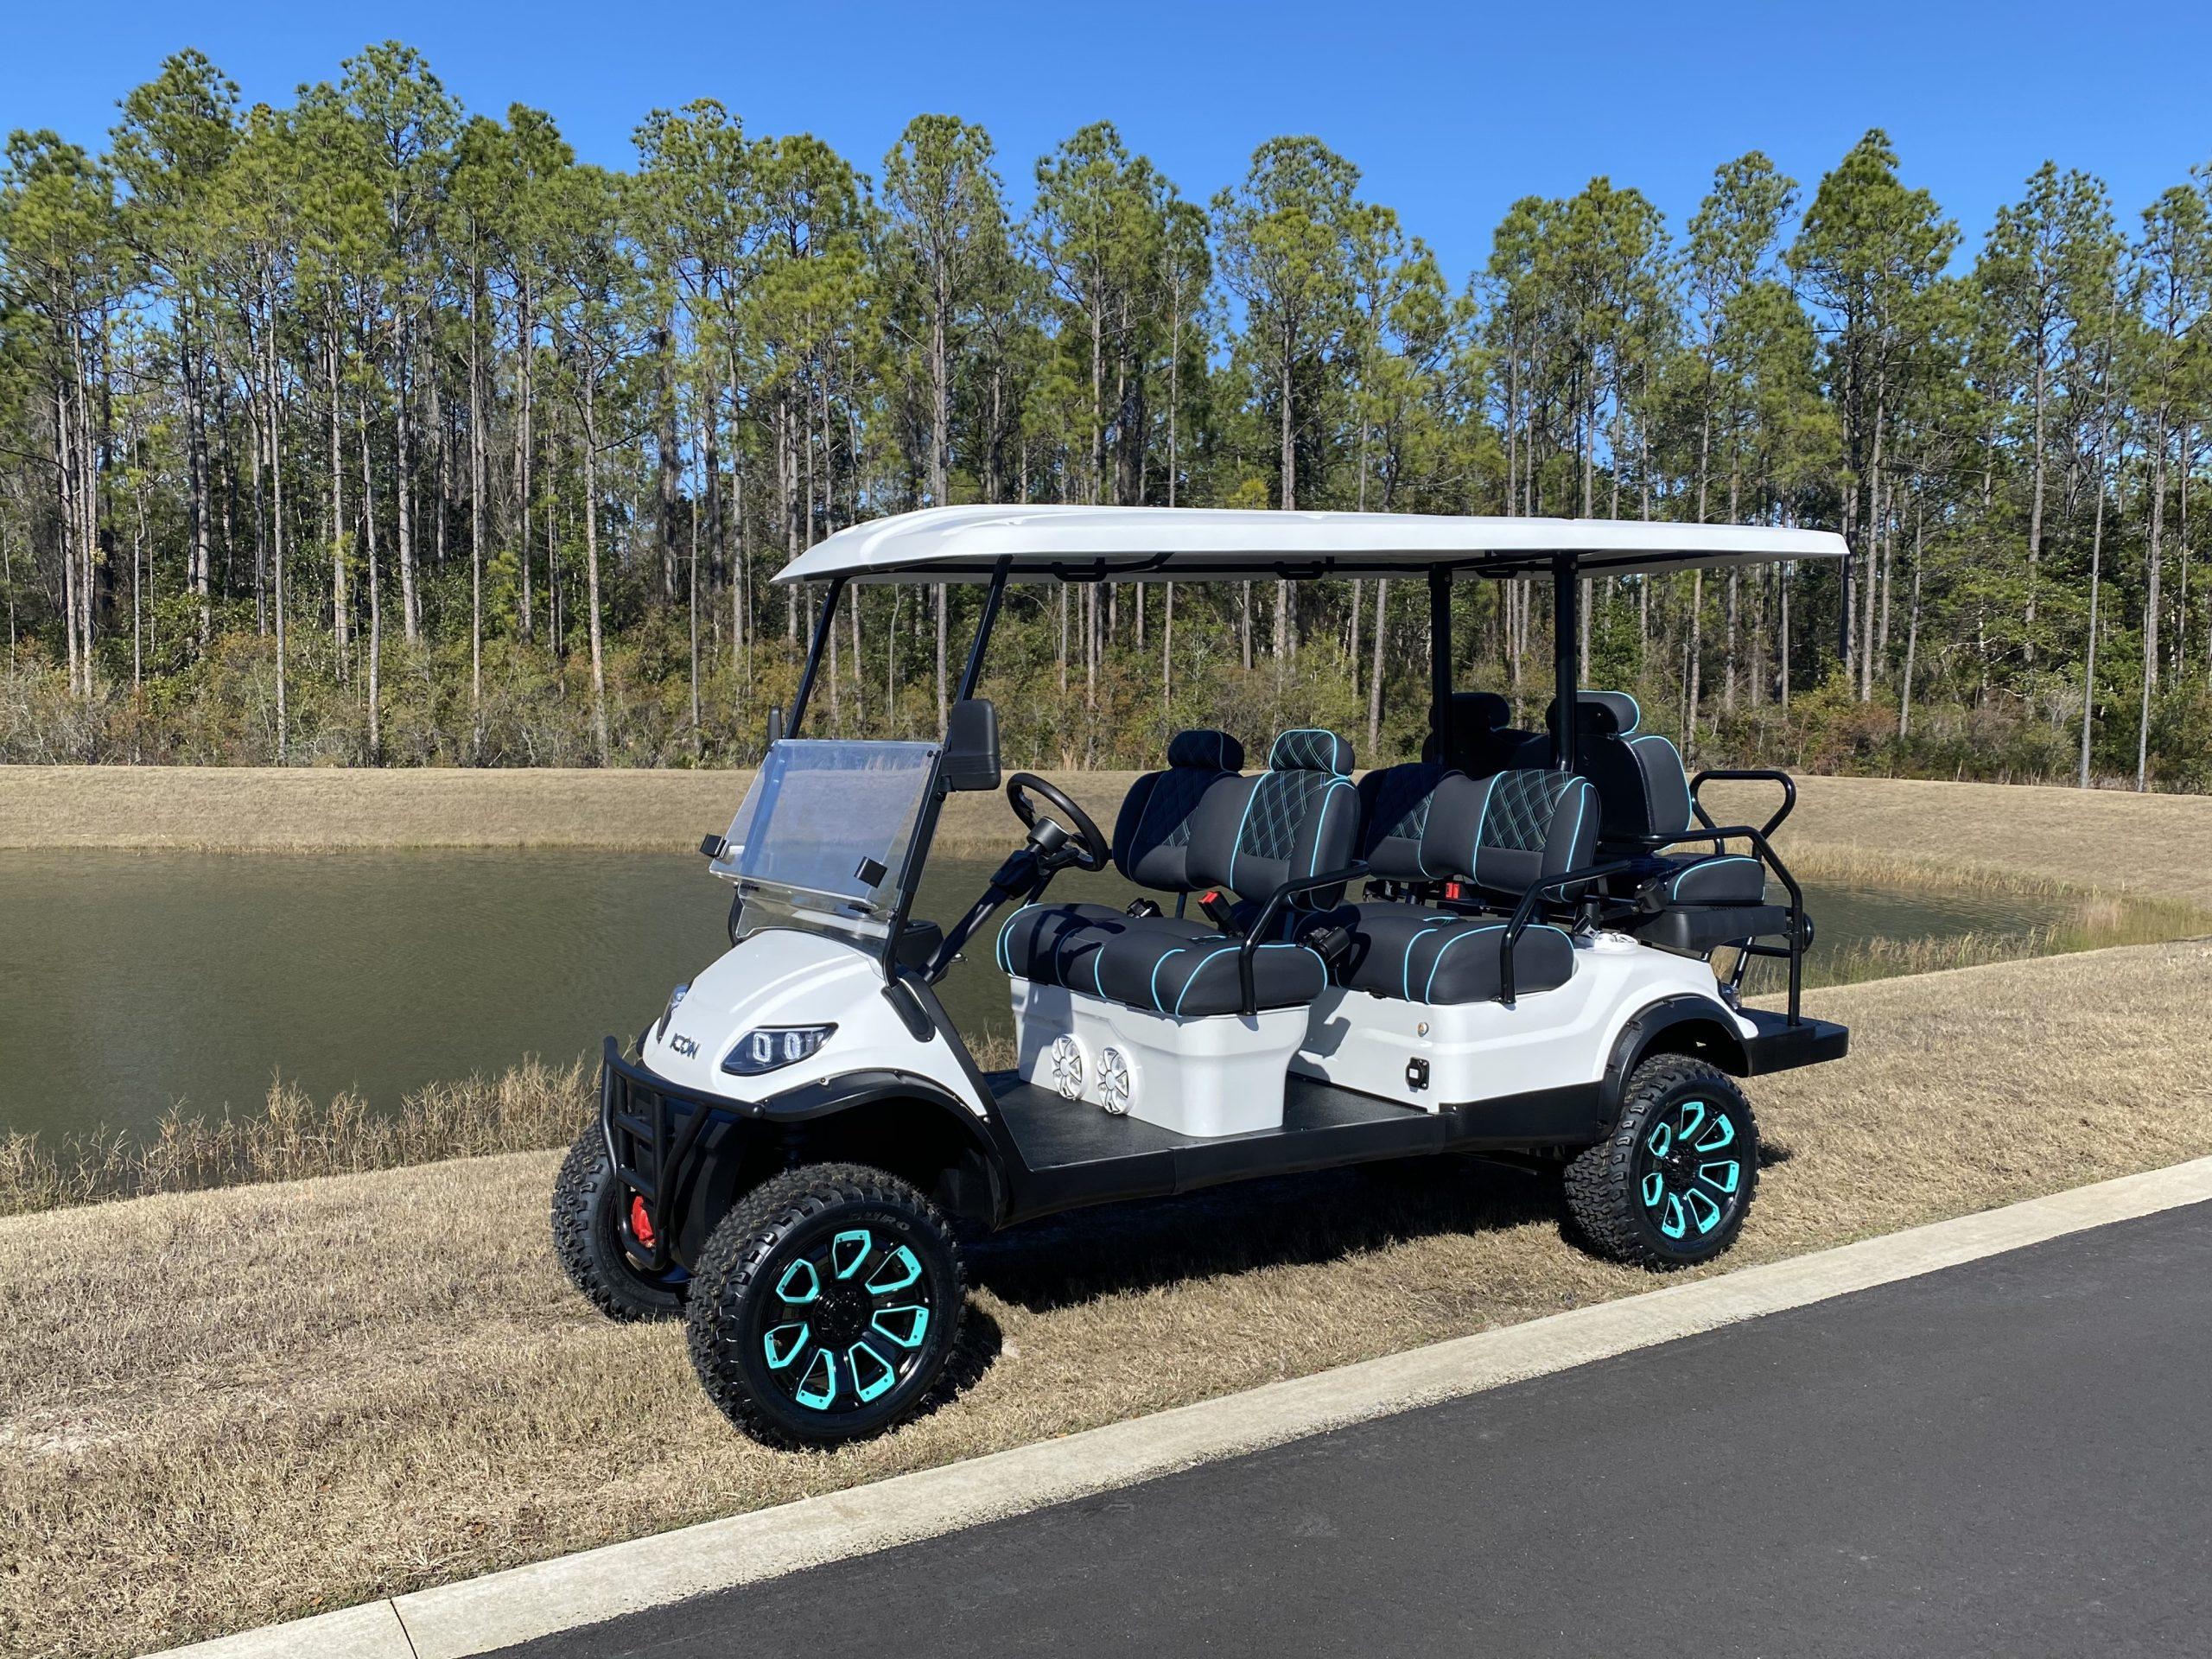 Custom 2021 Icon Premium Golf Cart Rental with Wet Sounds Premium Audio